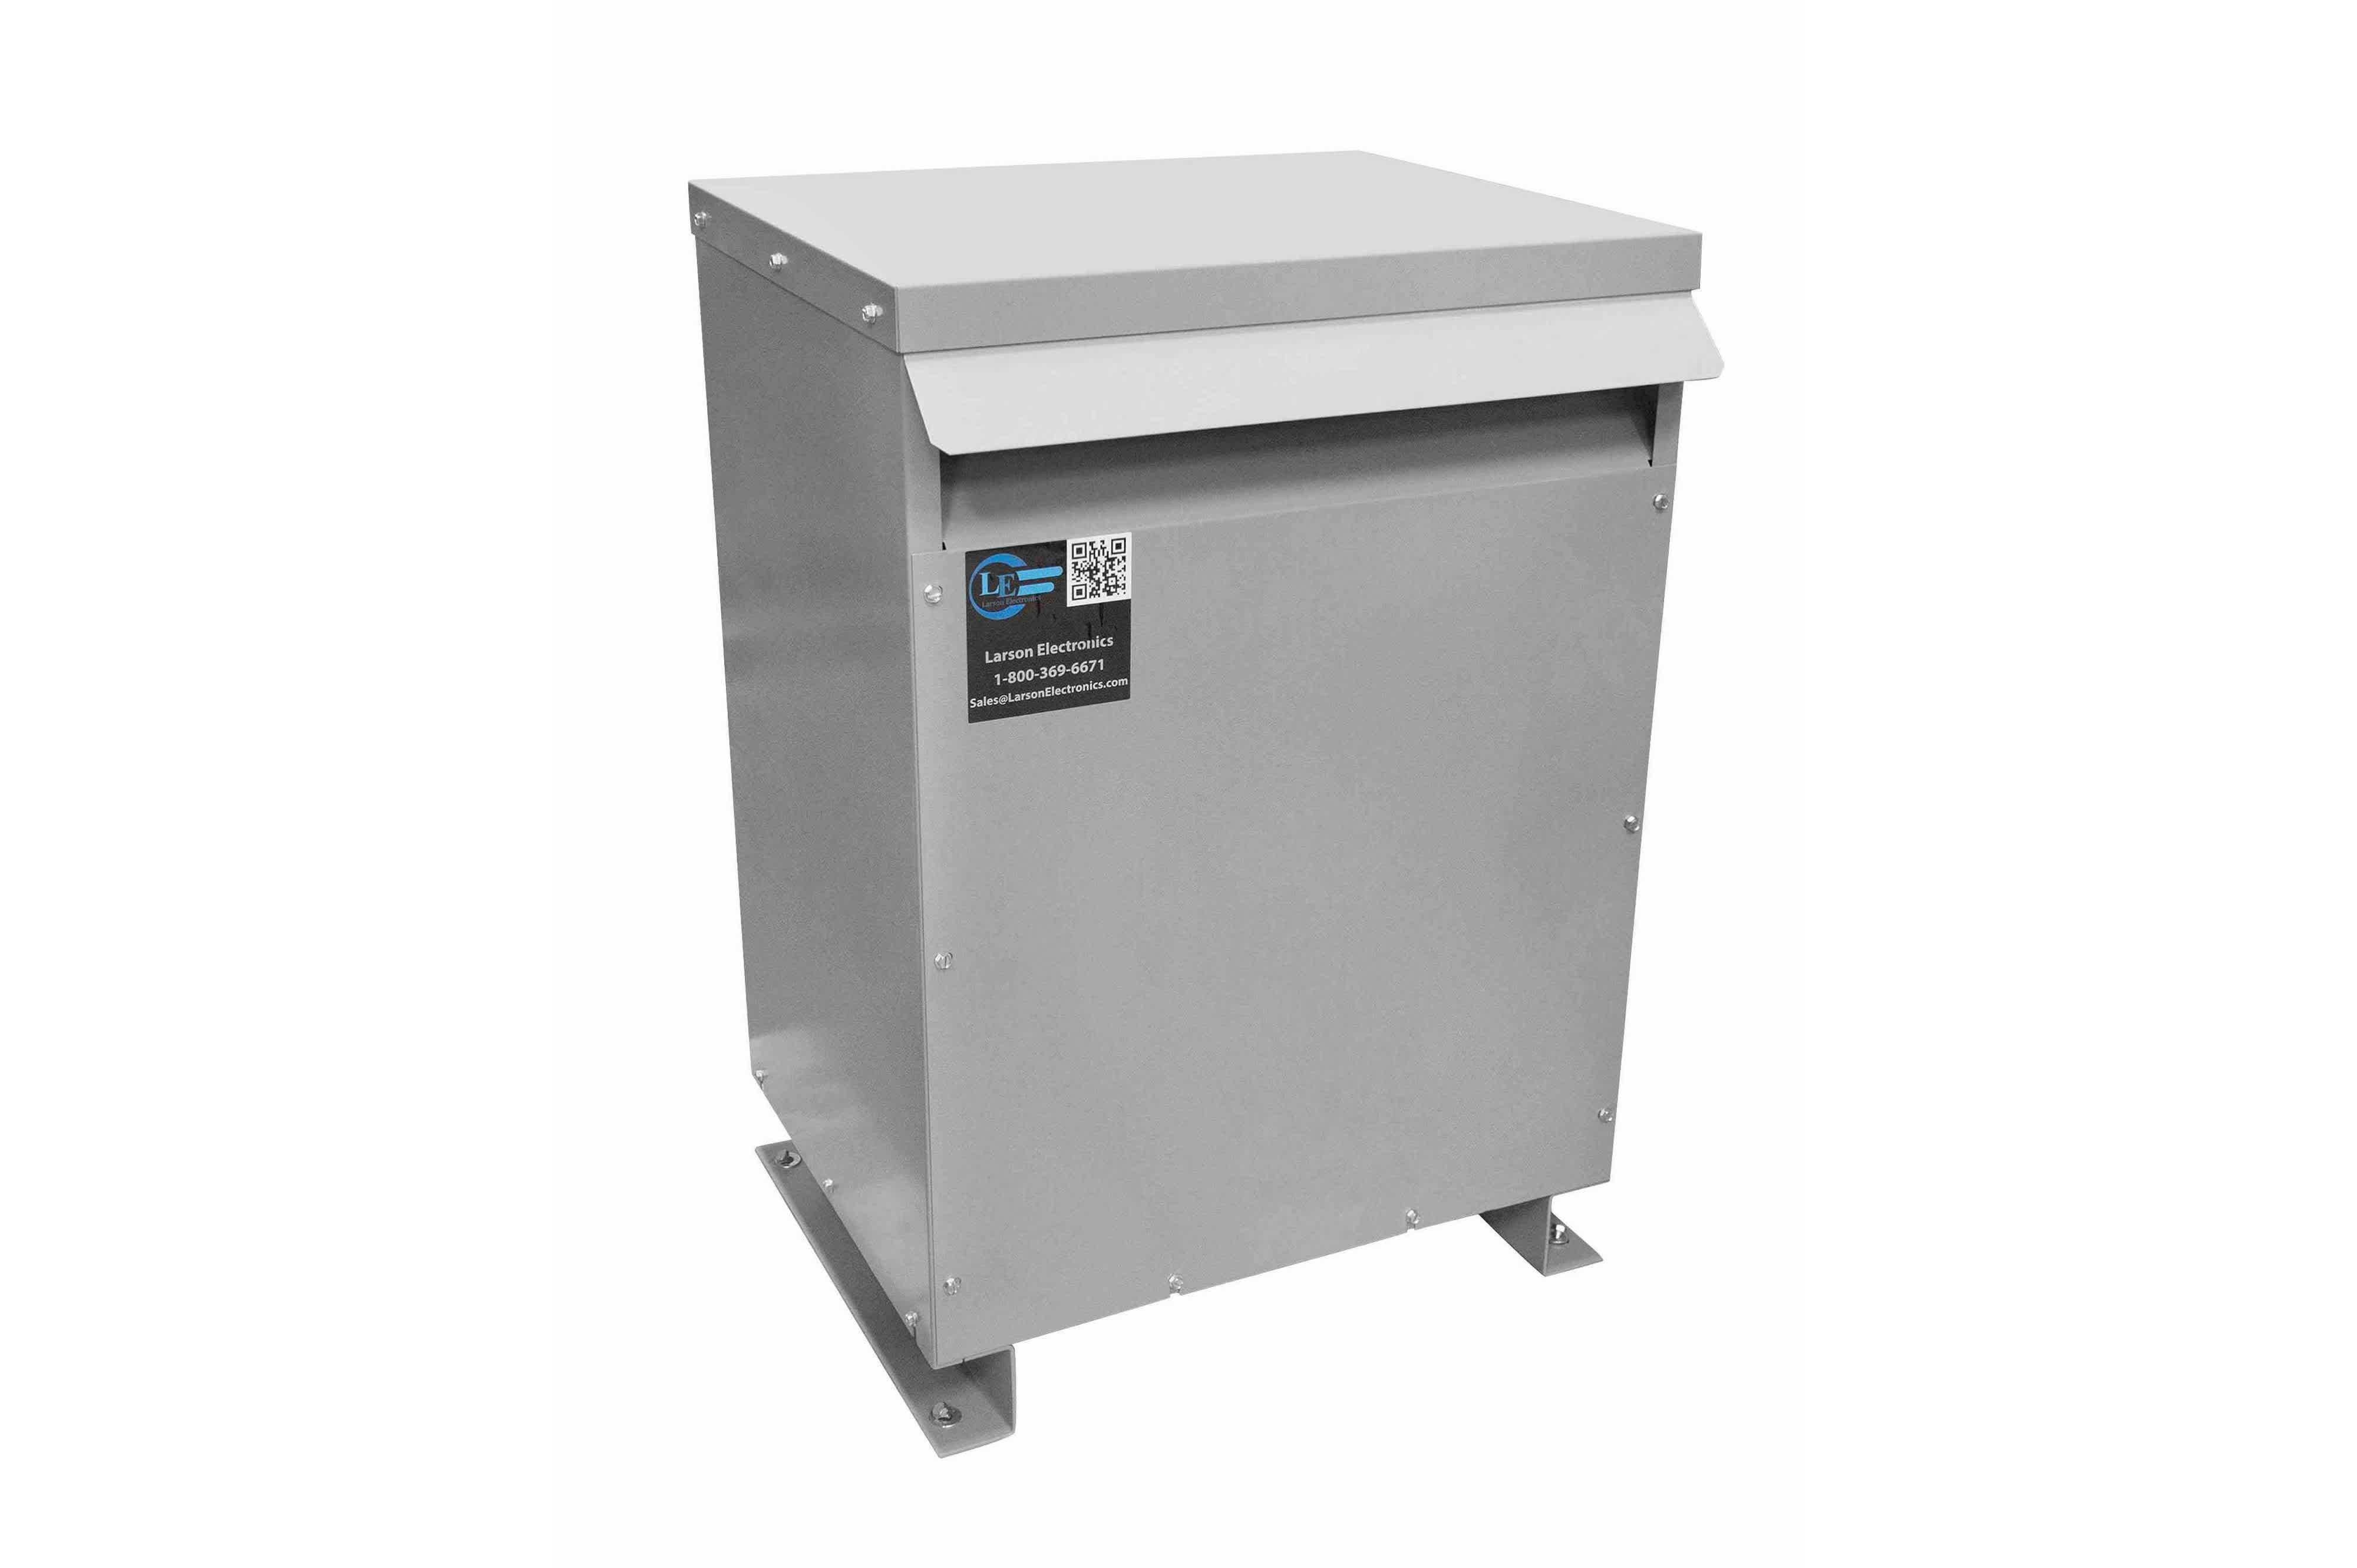 75 kVA 3PH Isolation Transformer, 208V Wye Primary, 480Y/277 Wye-N Secondary, N3R, Ventilated, 60 Hz